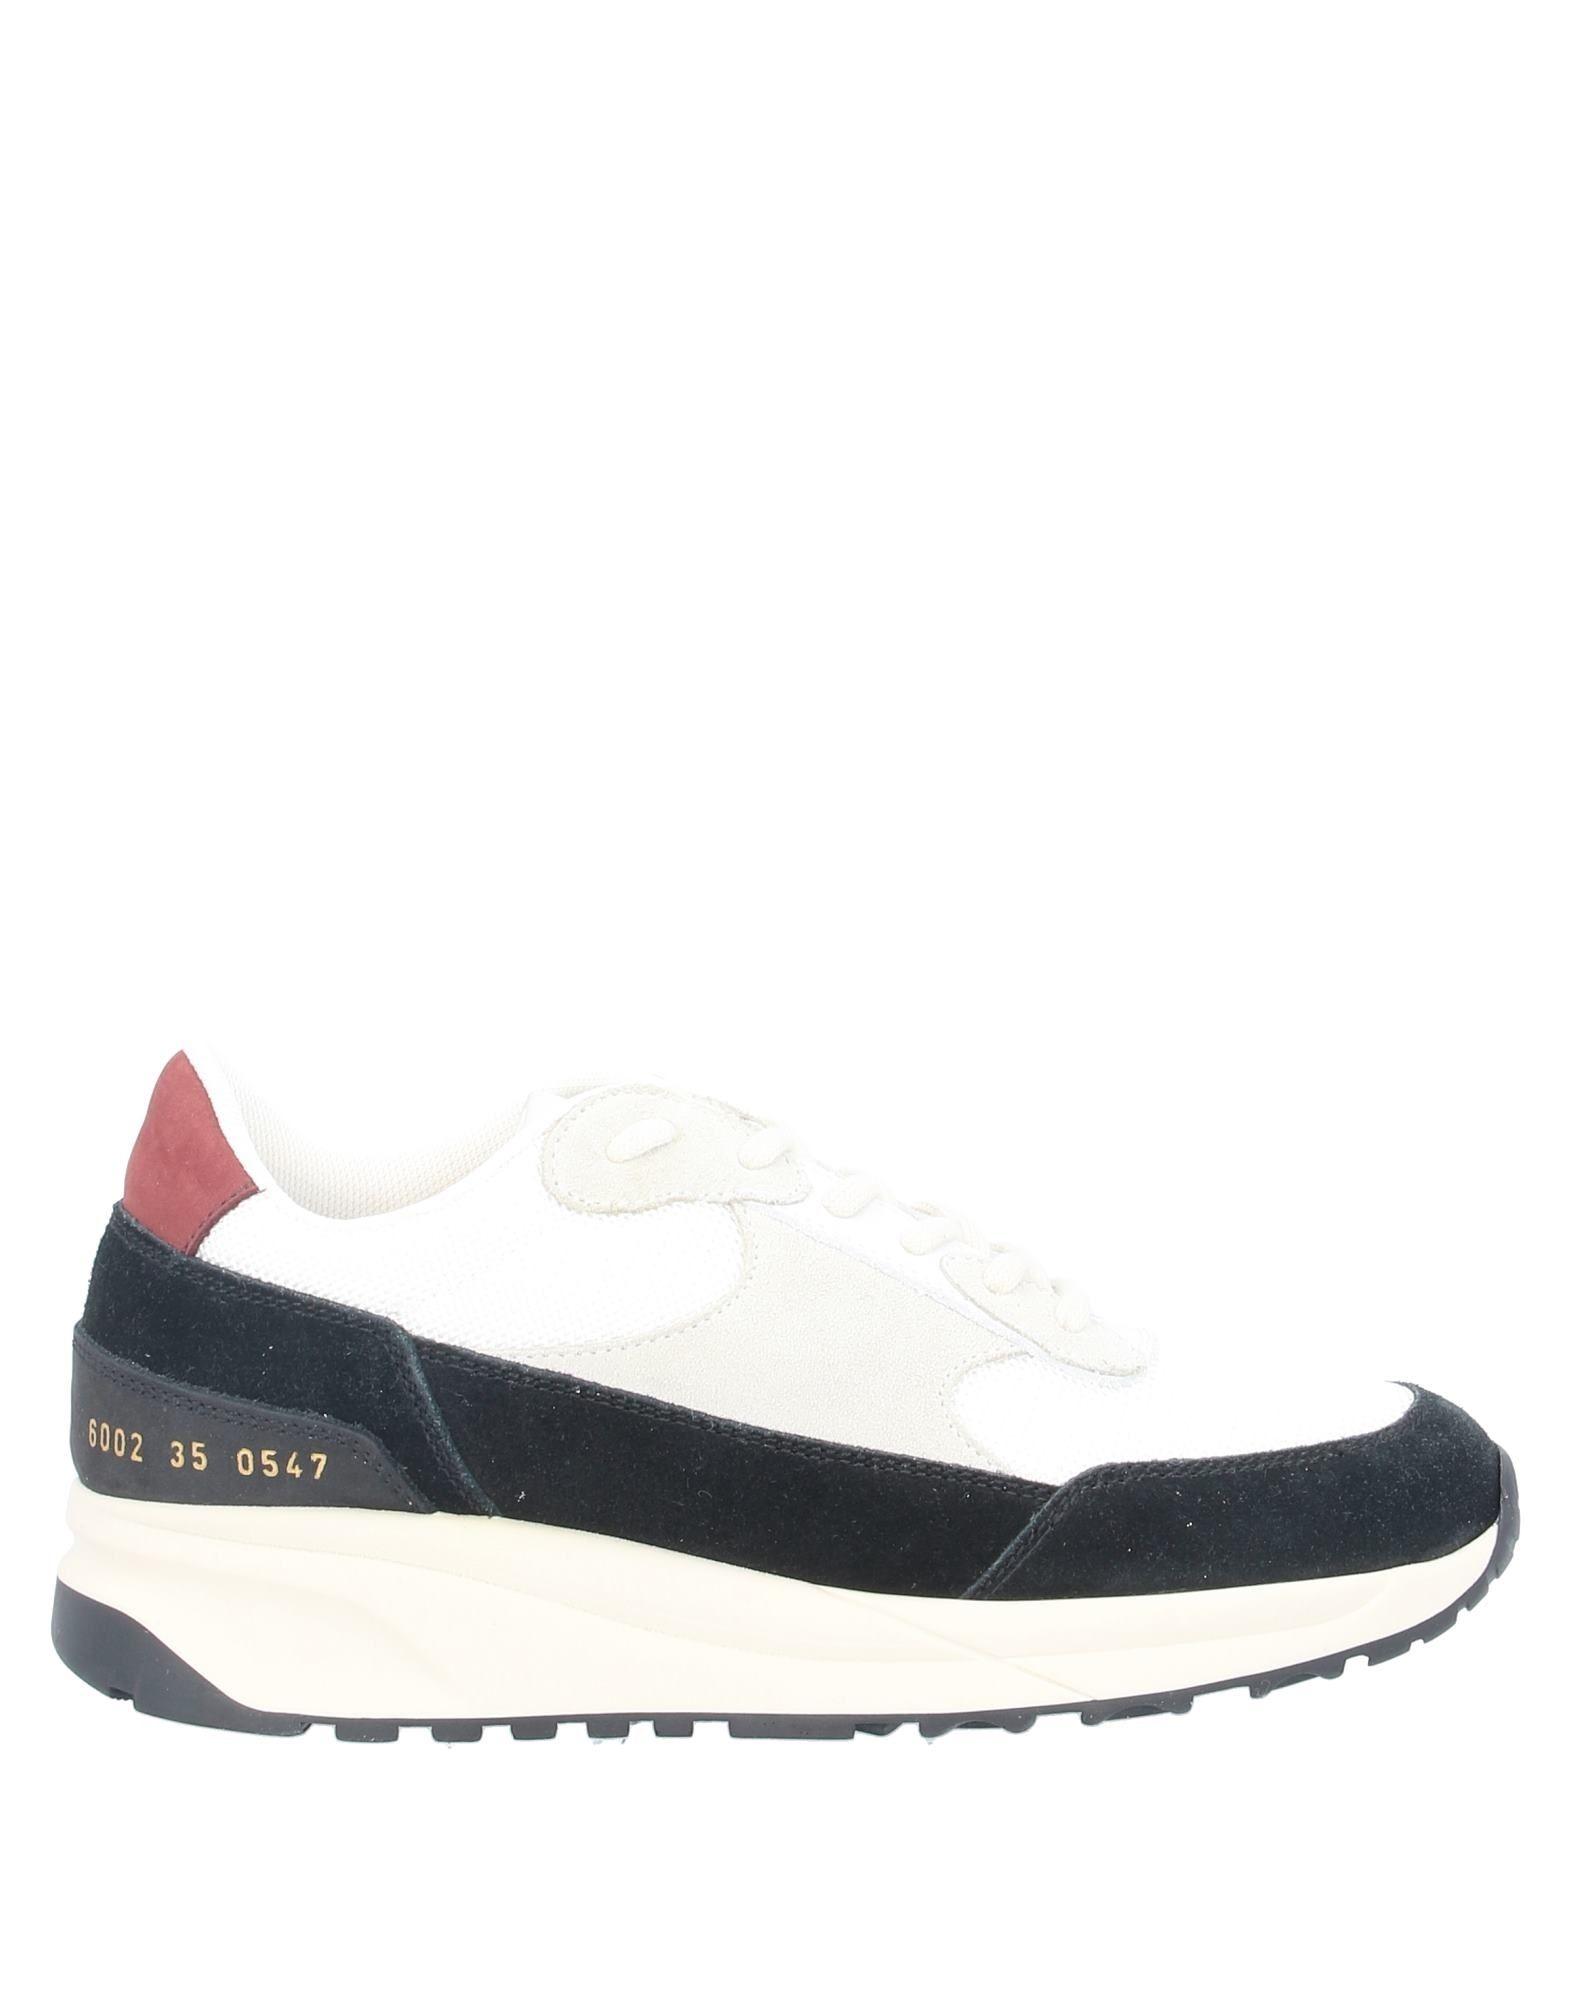 WOMAN by COMMON PROJECTS Низкие кеды и кроссовки common projects обувь на шнурках